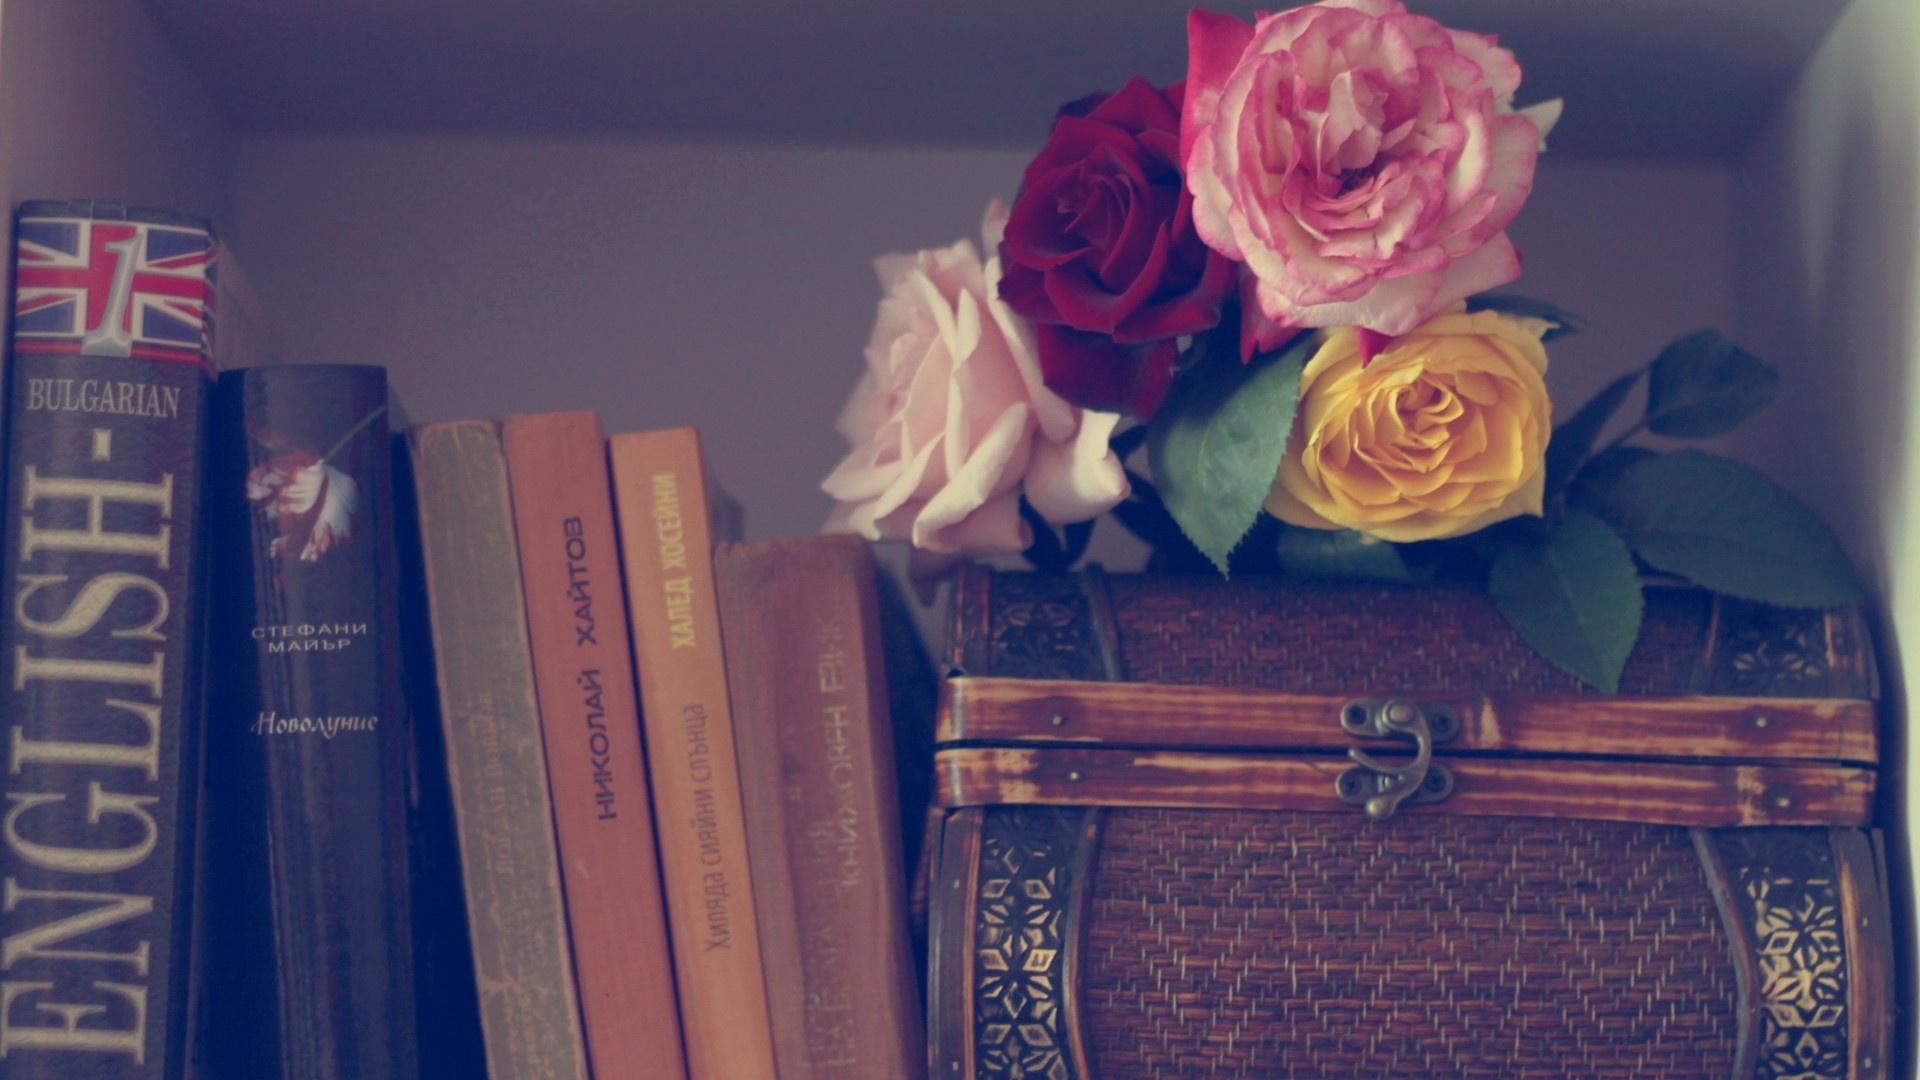 Book And Flower wallpaper for desktop